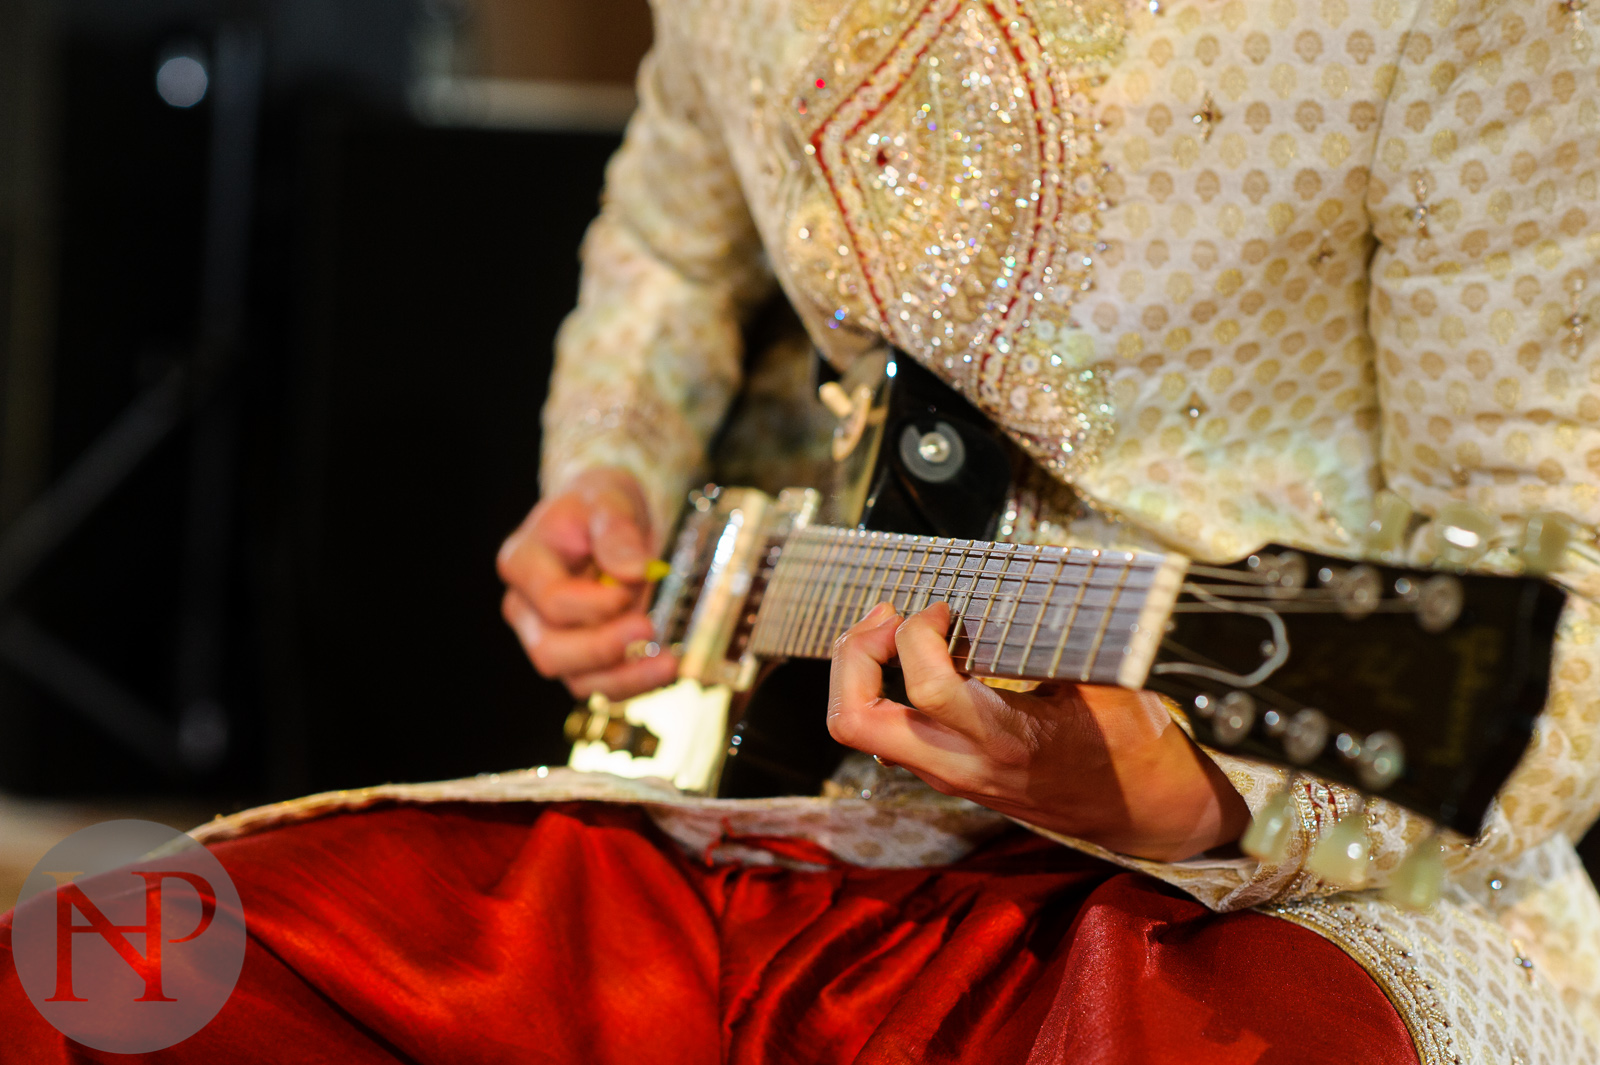 washington dc music photographer noah hayes georgetown dc va md alexandria - madarin hotel - oriental - indian - chinese - naina christopher.jpg-44.jpg